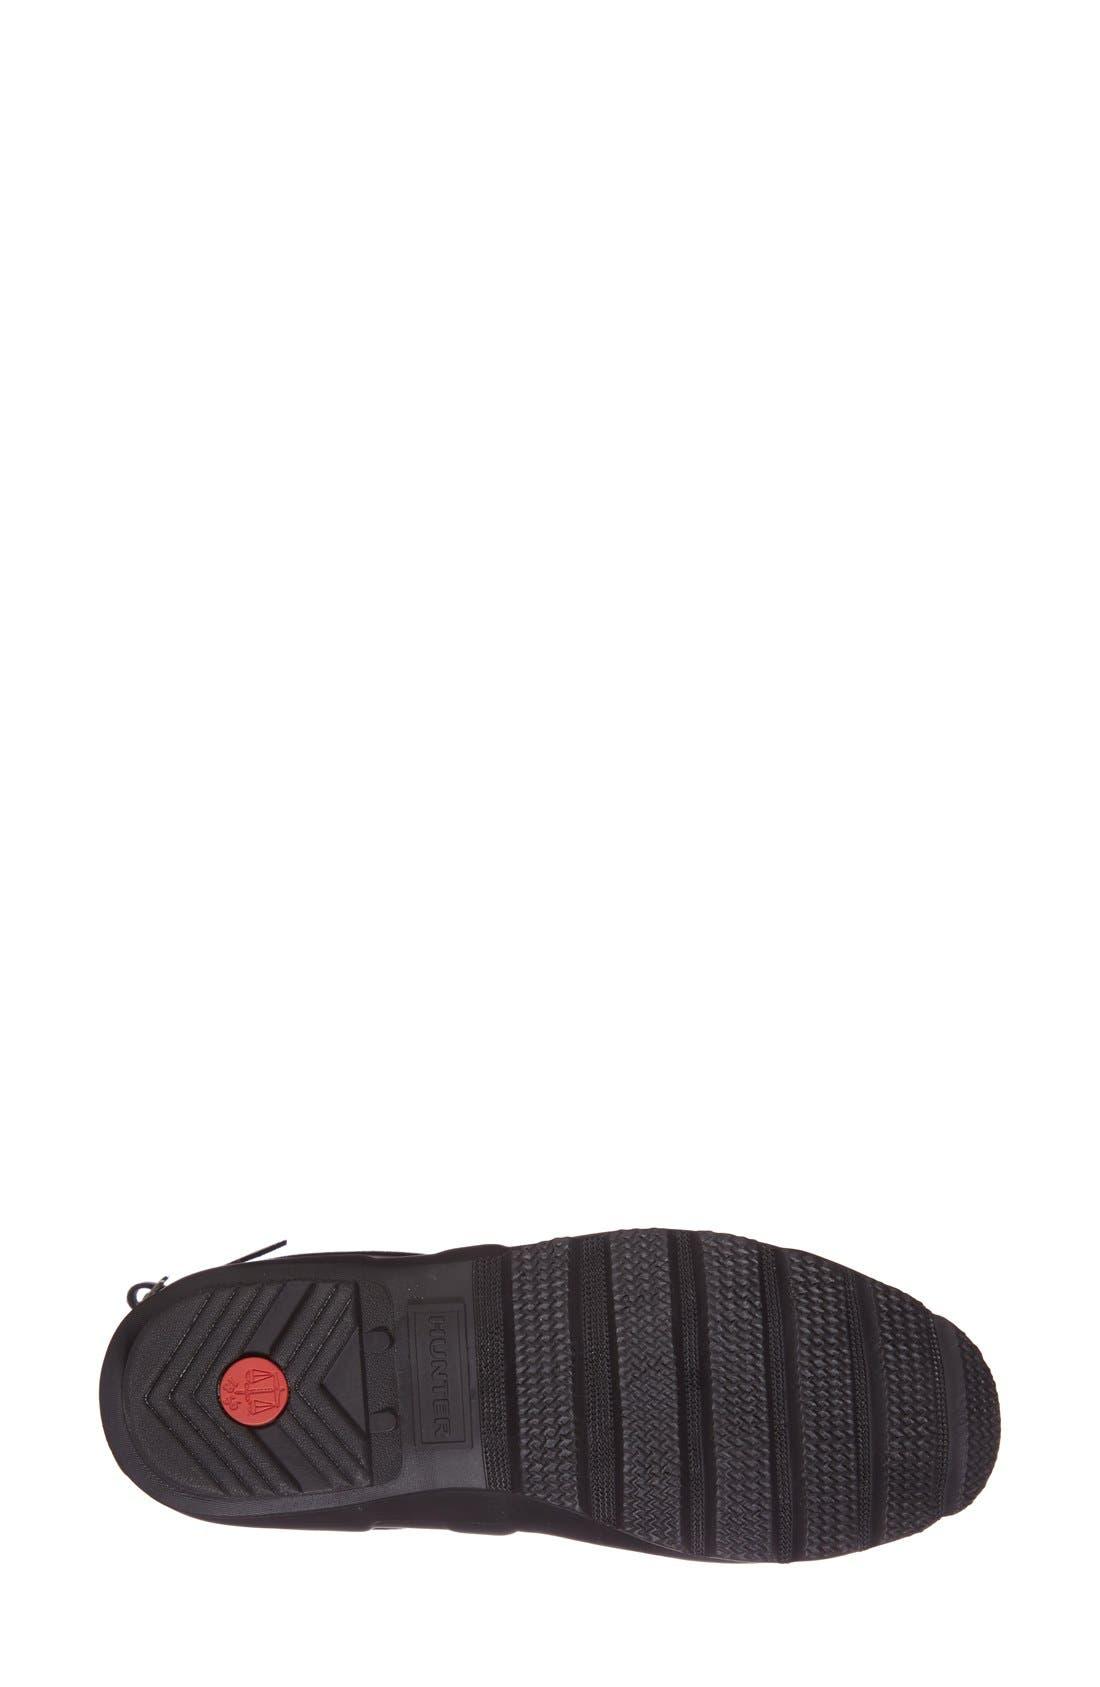 HUNTER, Original Short Back Adjustable Waterproof Rain Boot, Alternate thumbnail 4, color, BLACK